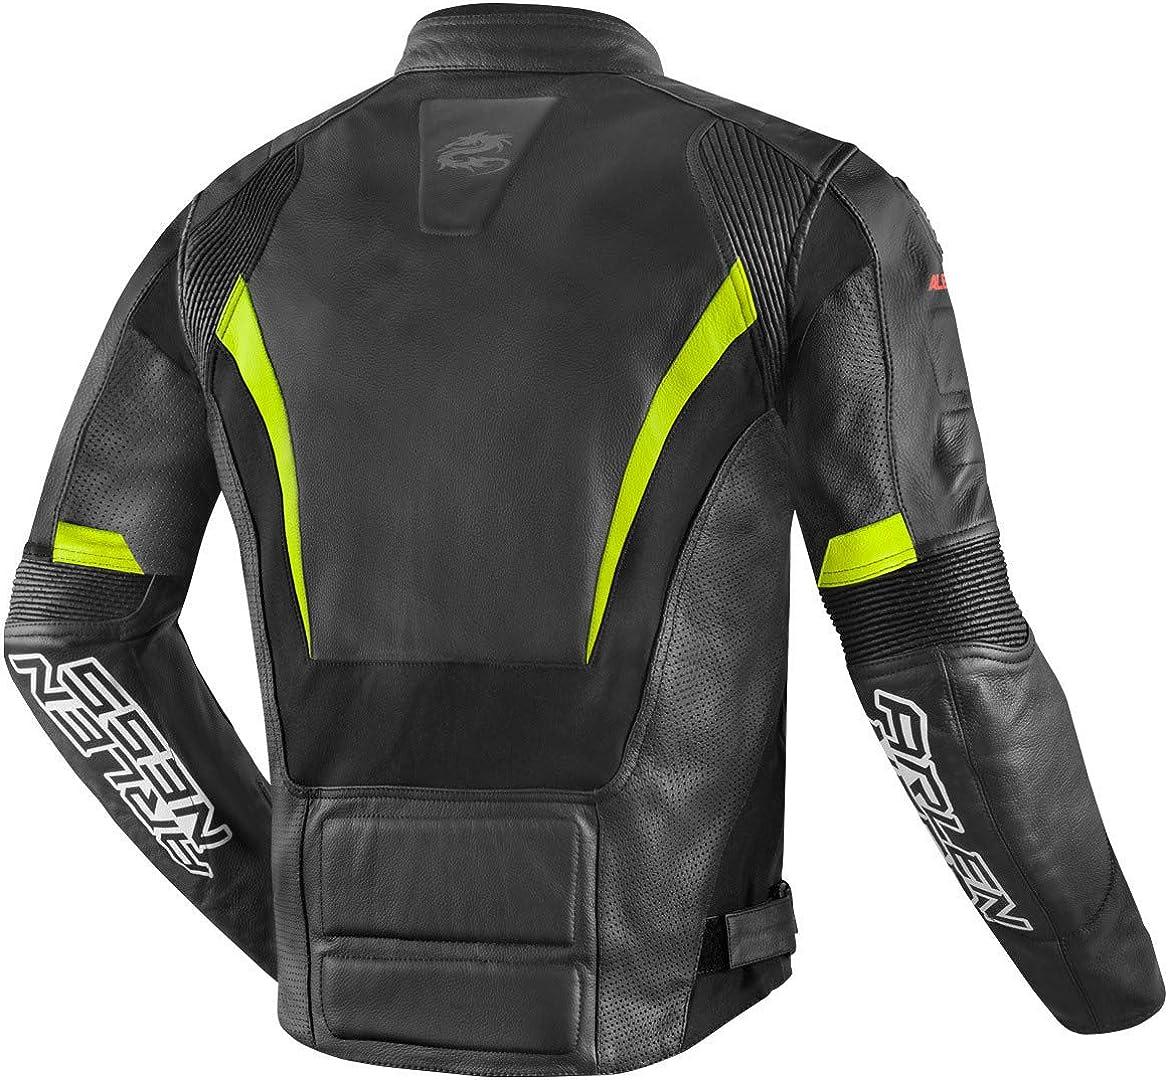 Arlen Ness Sportivo Motorcycle Racing Sport Leather Jacket